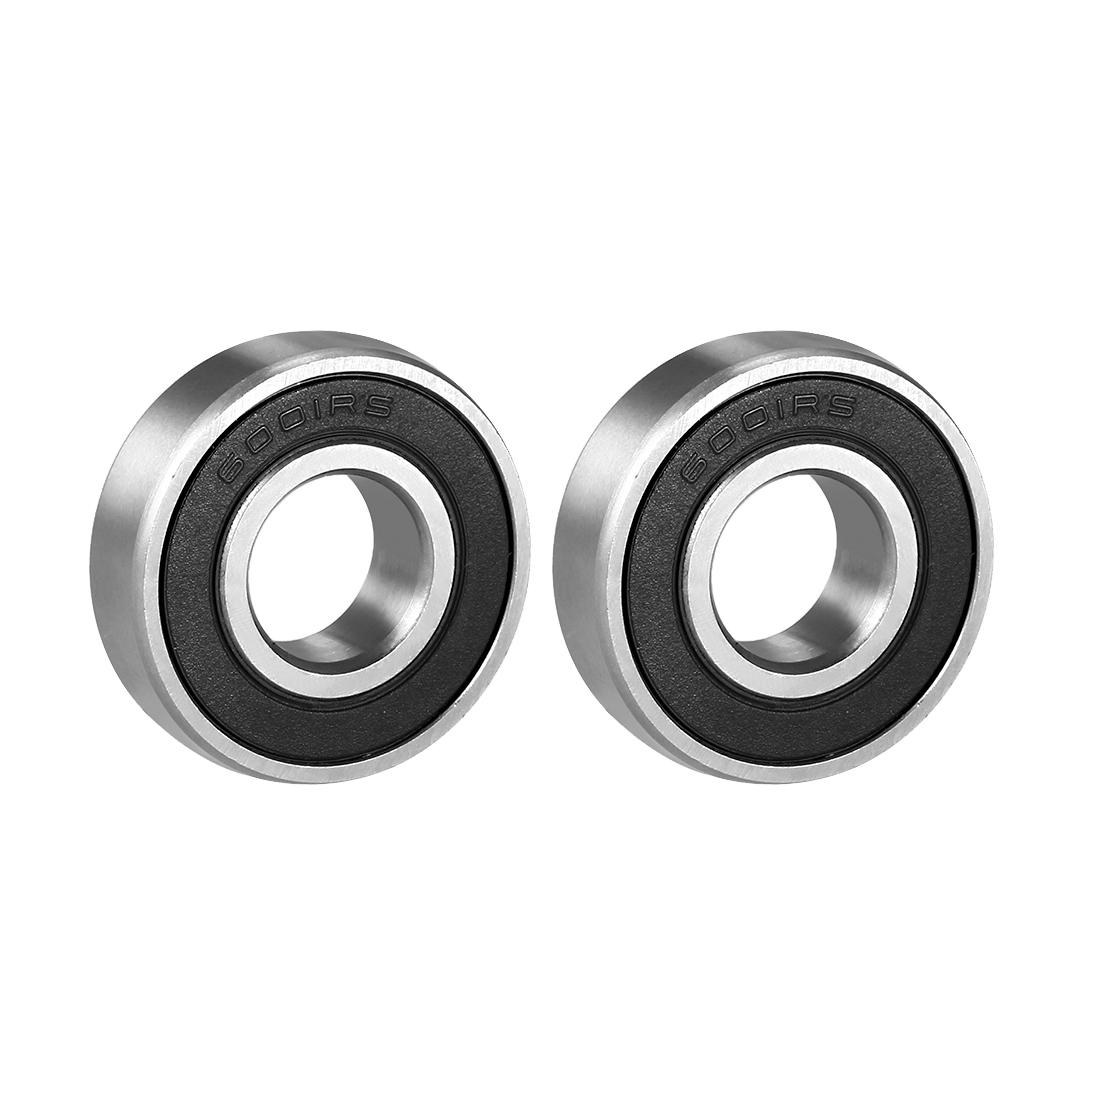 2pcs Deep Groove Ball Bearing 6001RS Single Sealed, 12mm x 28mm x 8mm Chrome Steel Bearings